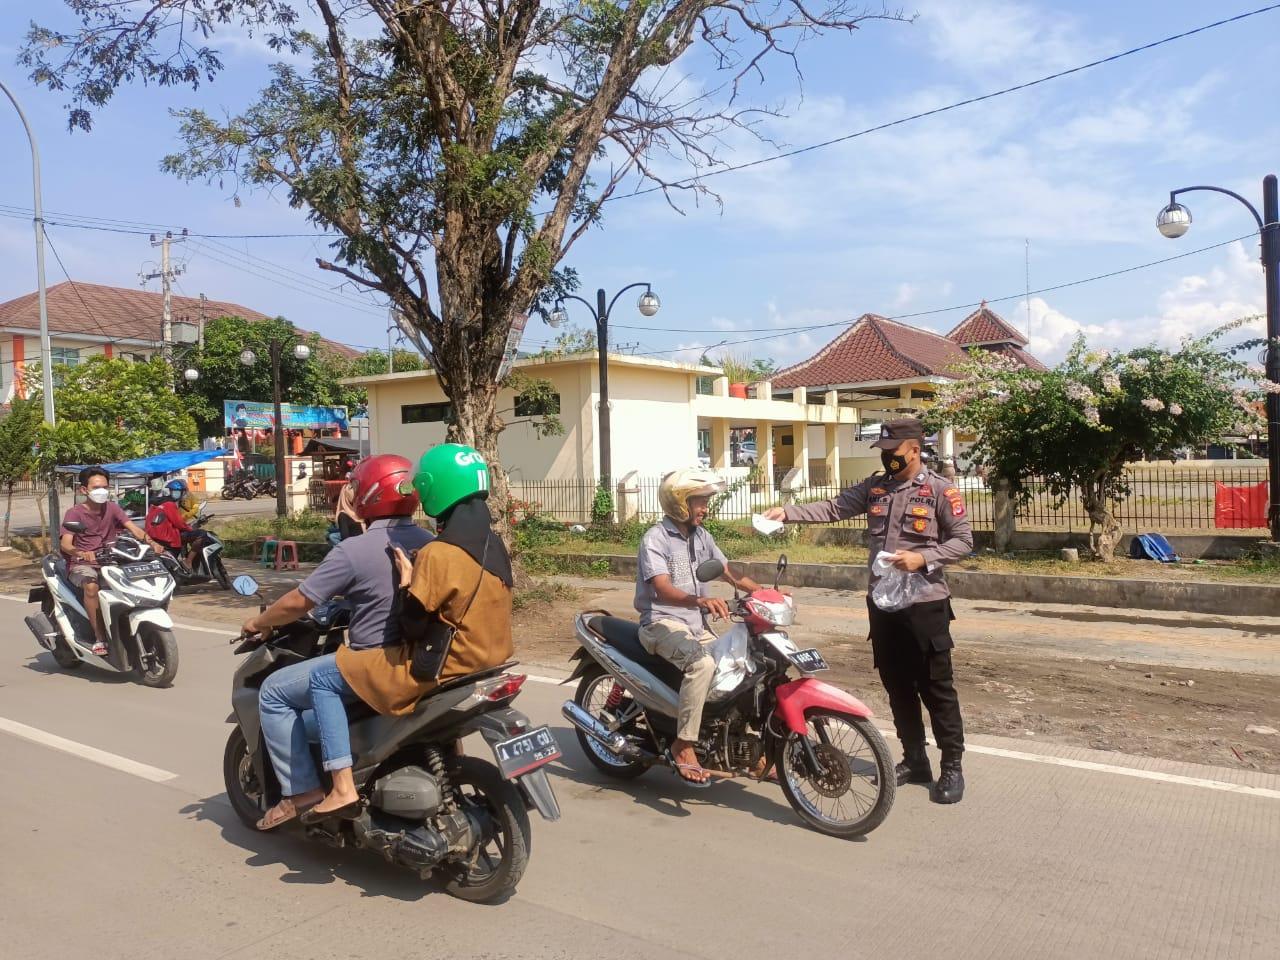 Gambar Untuk Kesekian Kalinya, Polsek Kramatwatu Bagikan Masker ke Pengguna Jalan 11